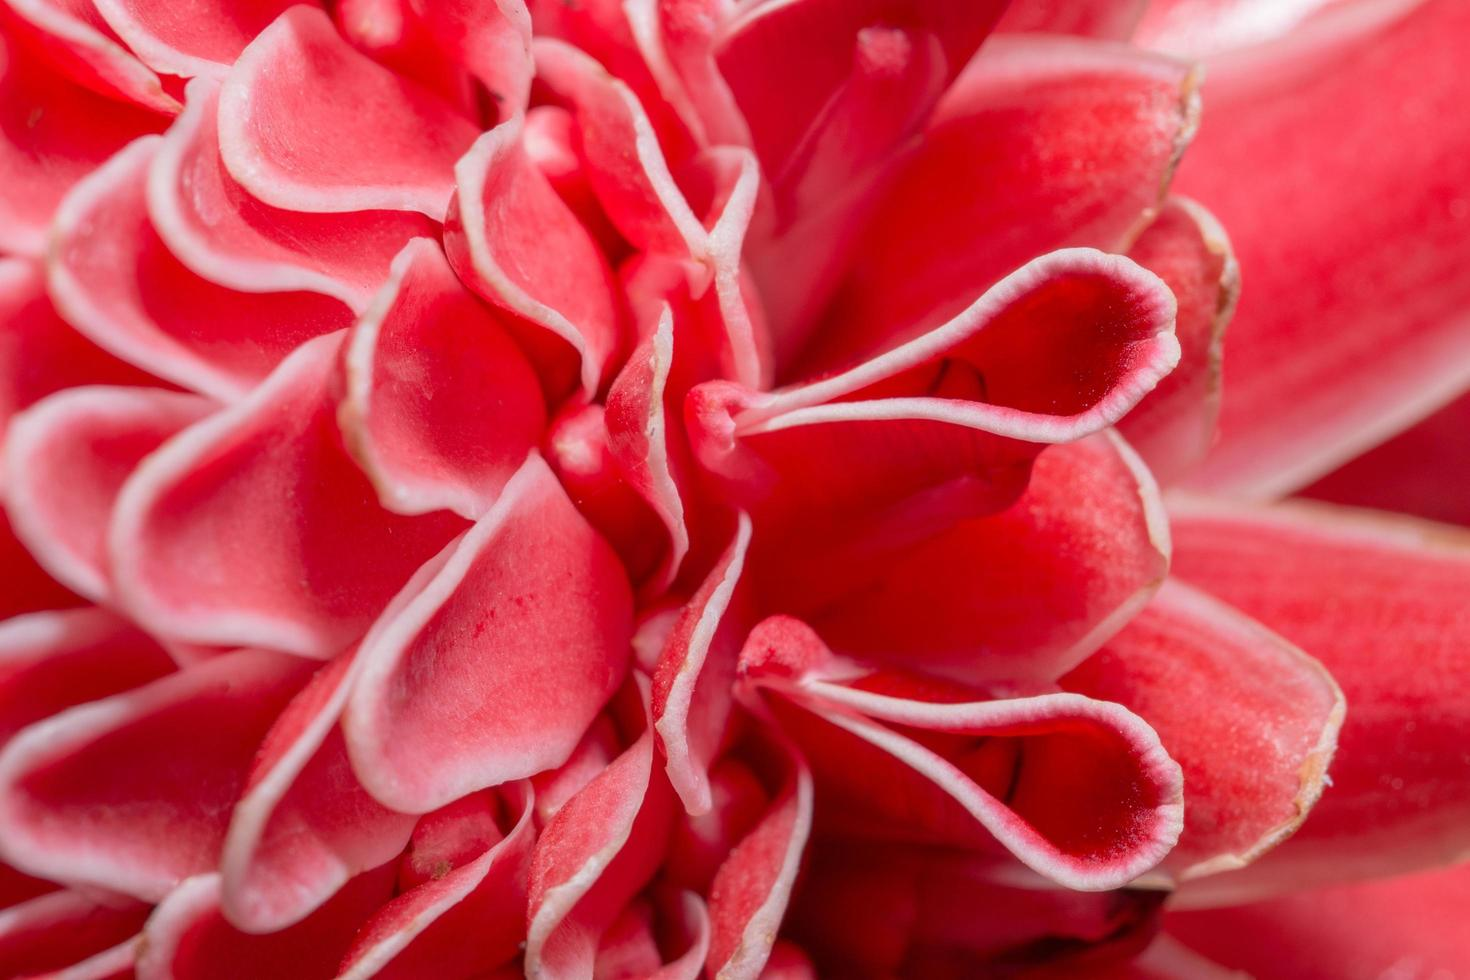 Pink flower petals close-up photo